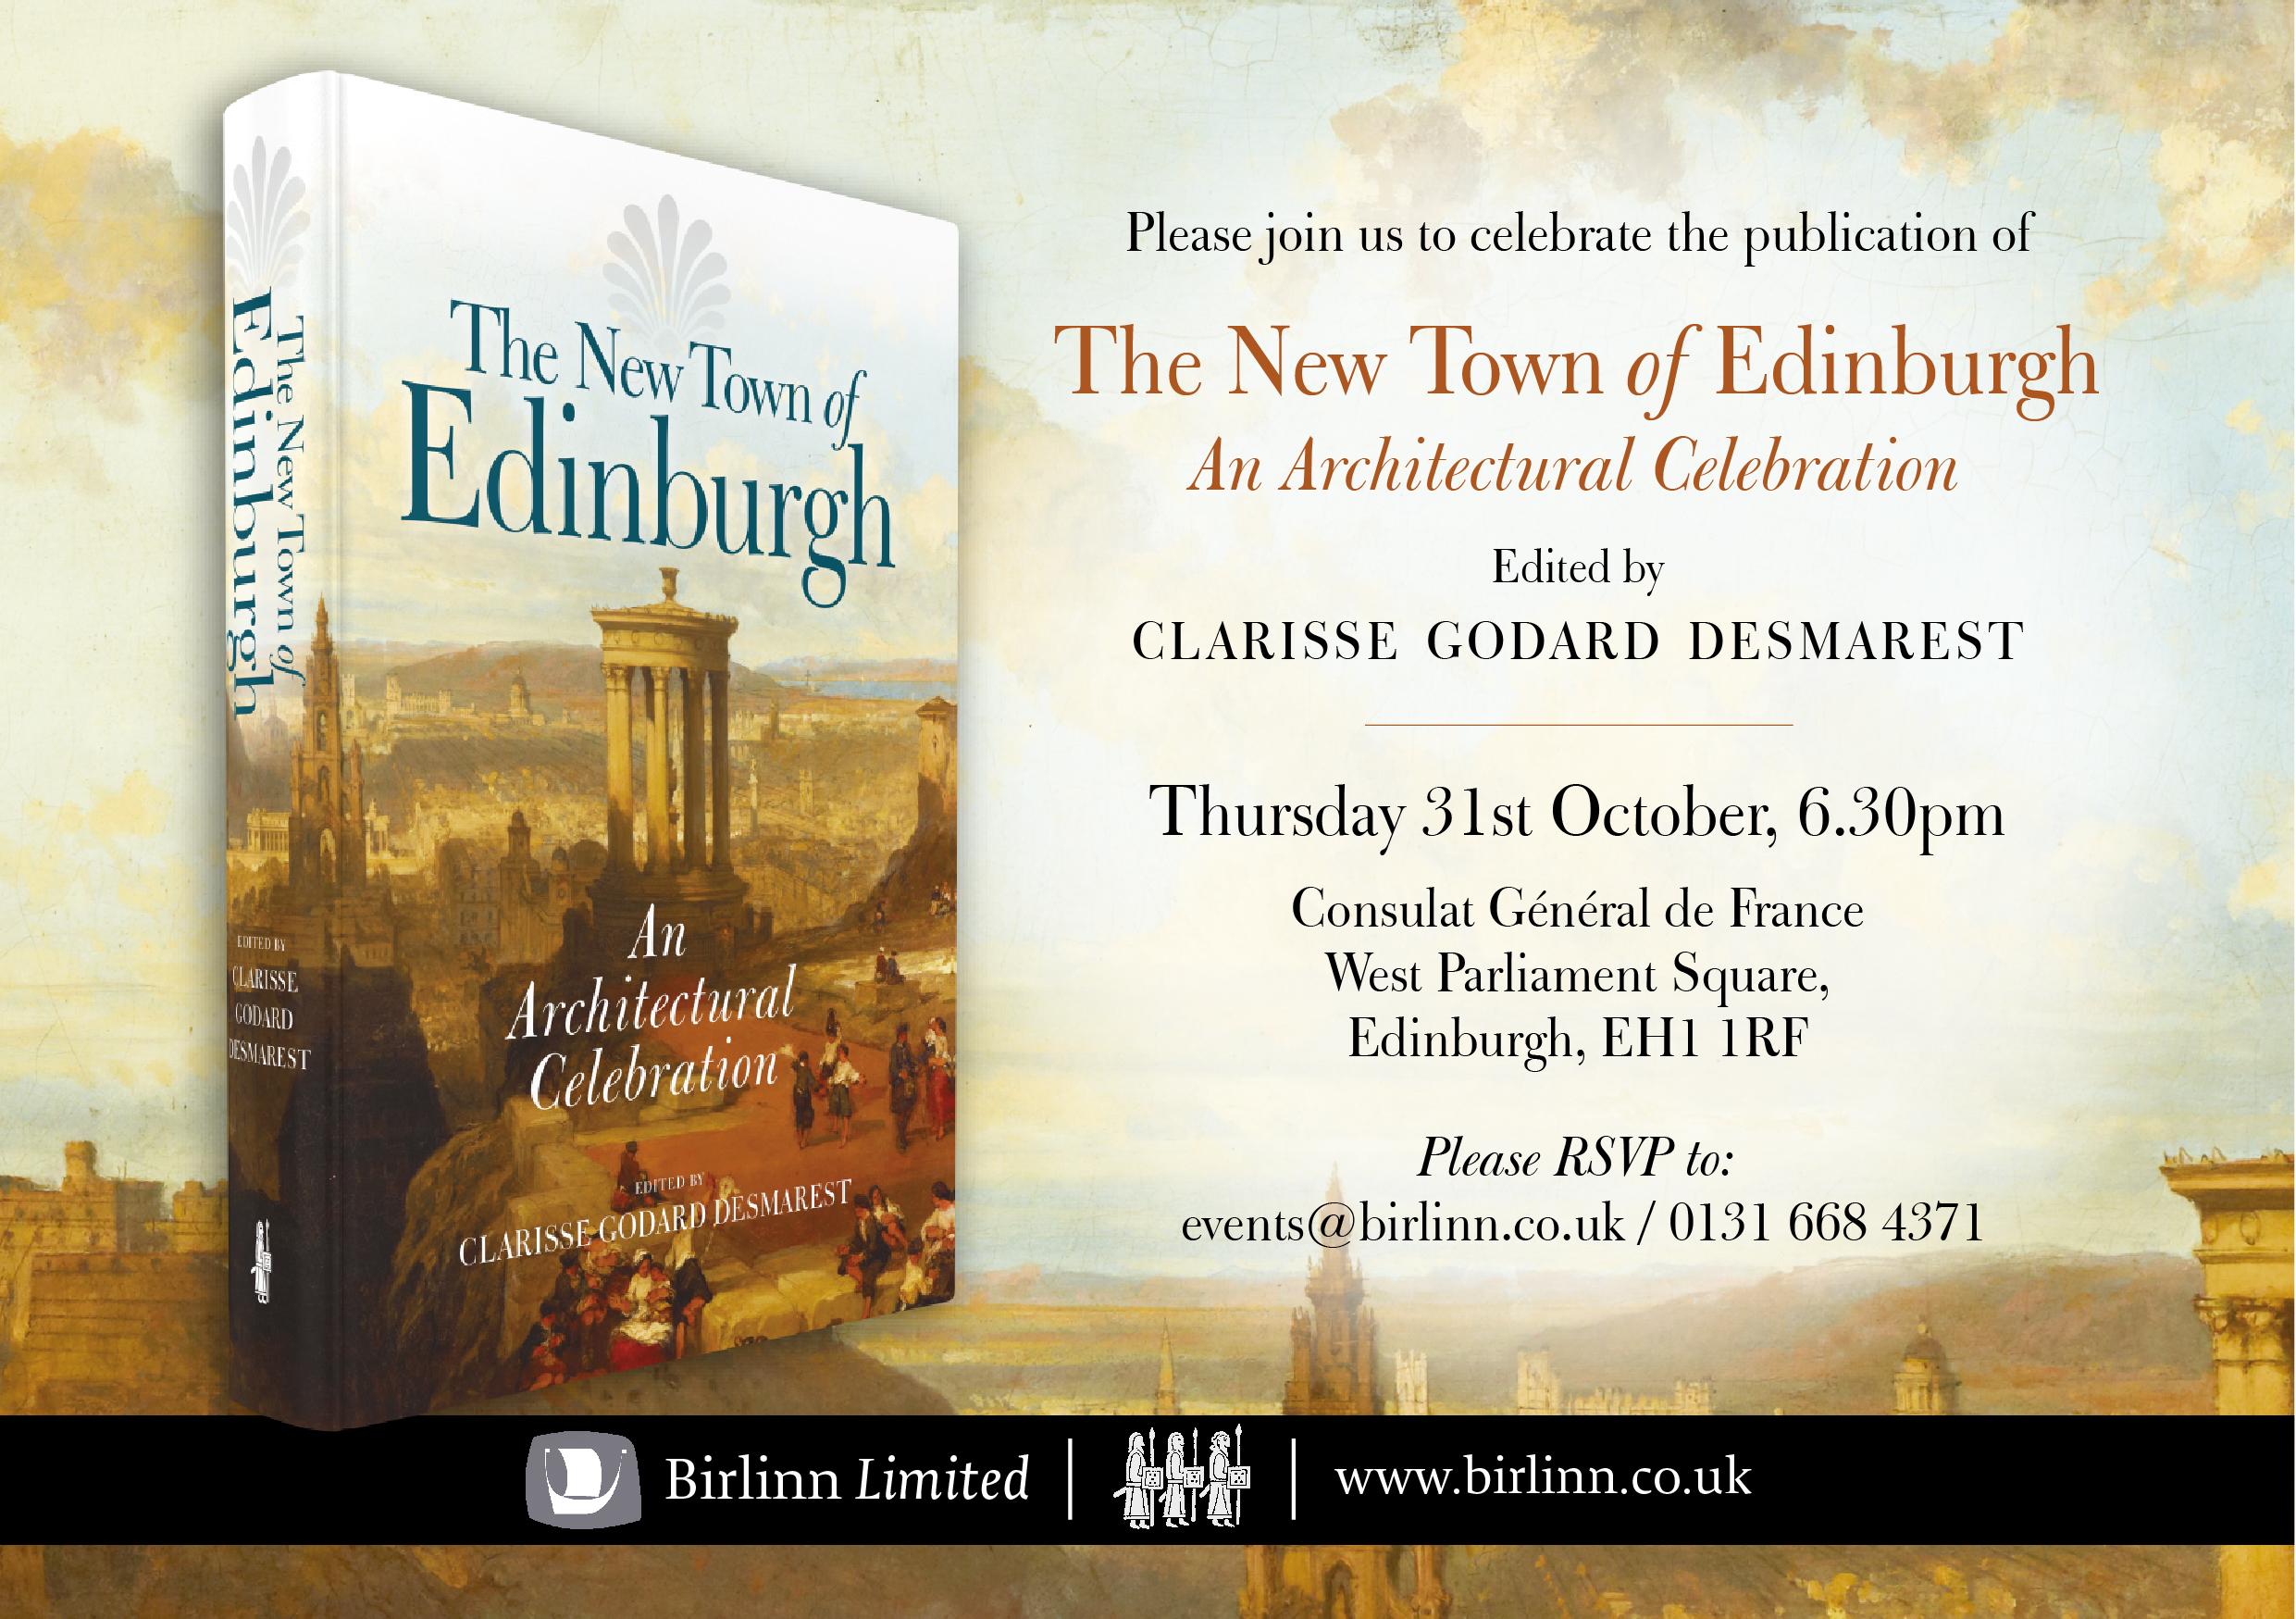 The New Town of Edinburgh